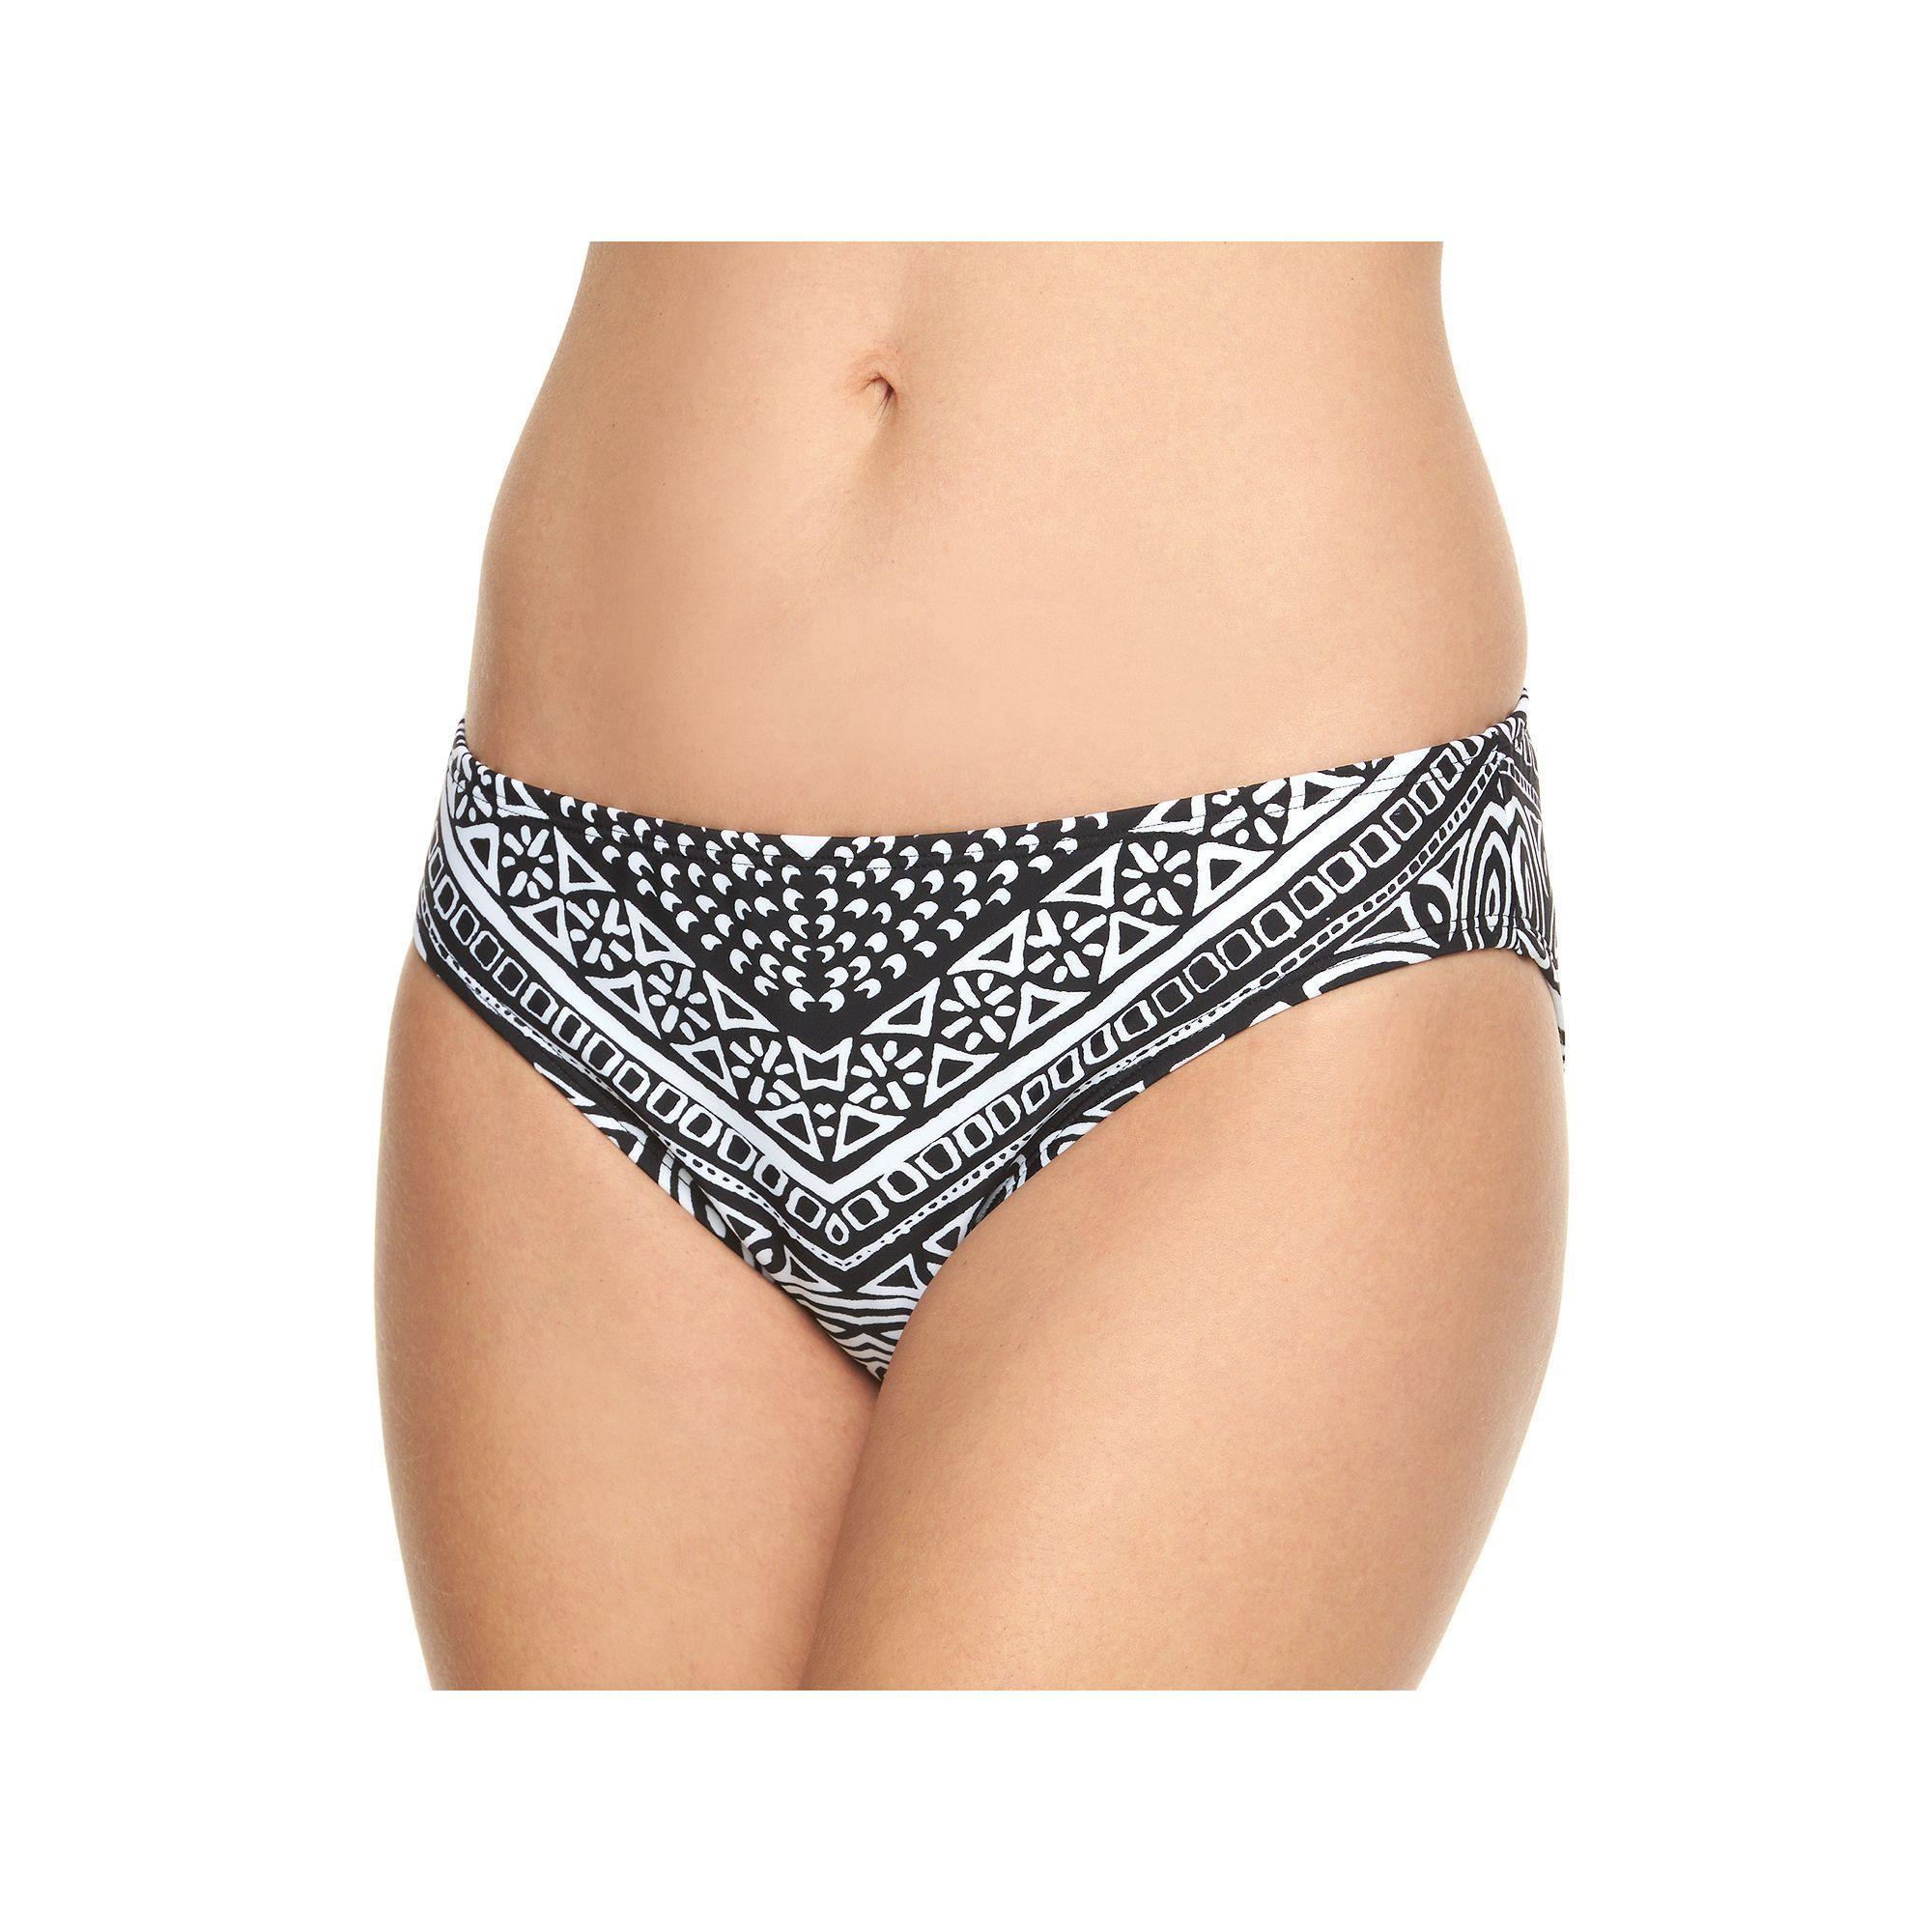 af5a847e28fca Women s Chaps Tribal Hipster Bikini Bottoms